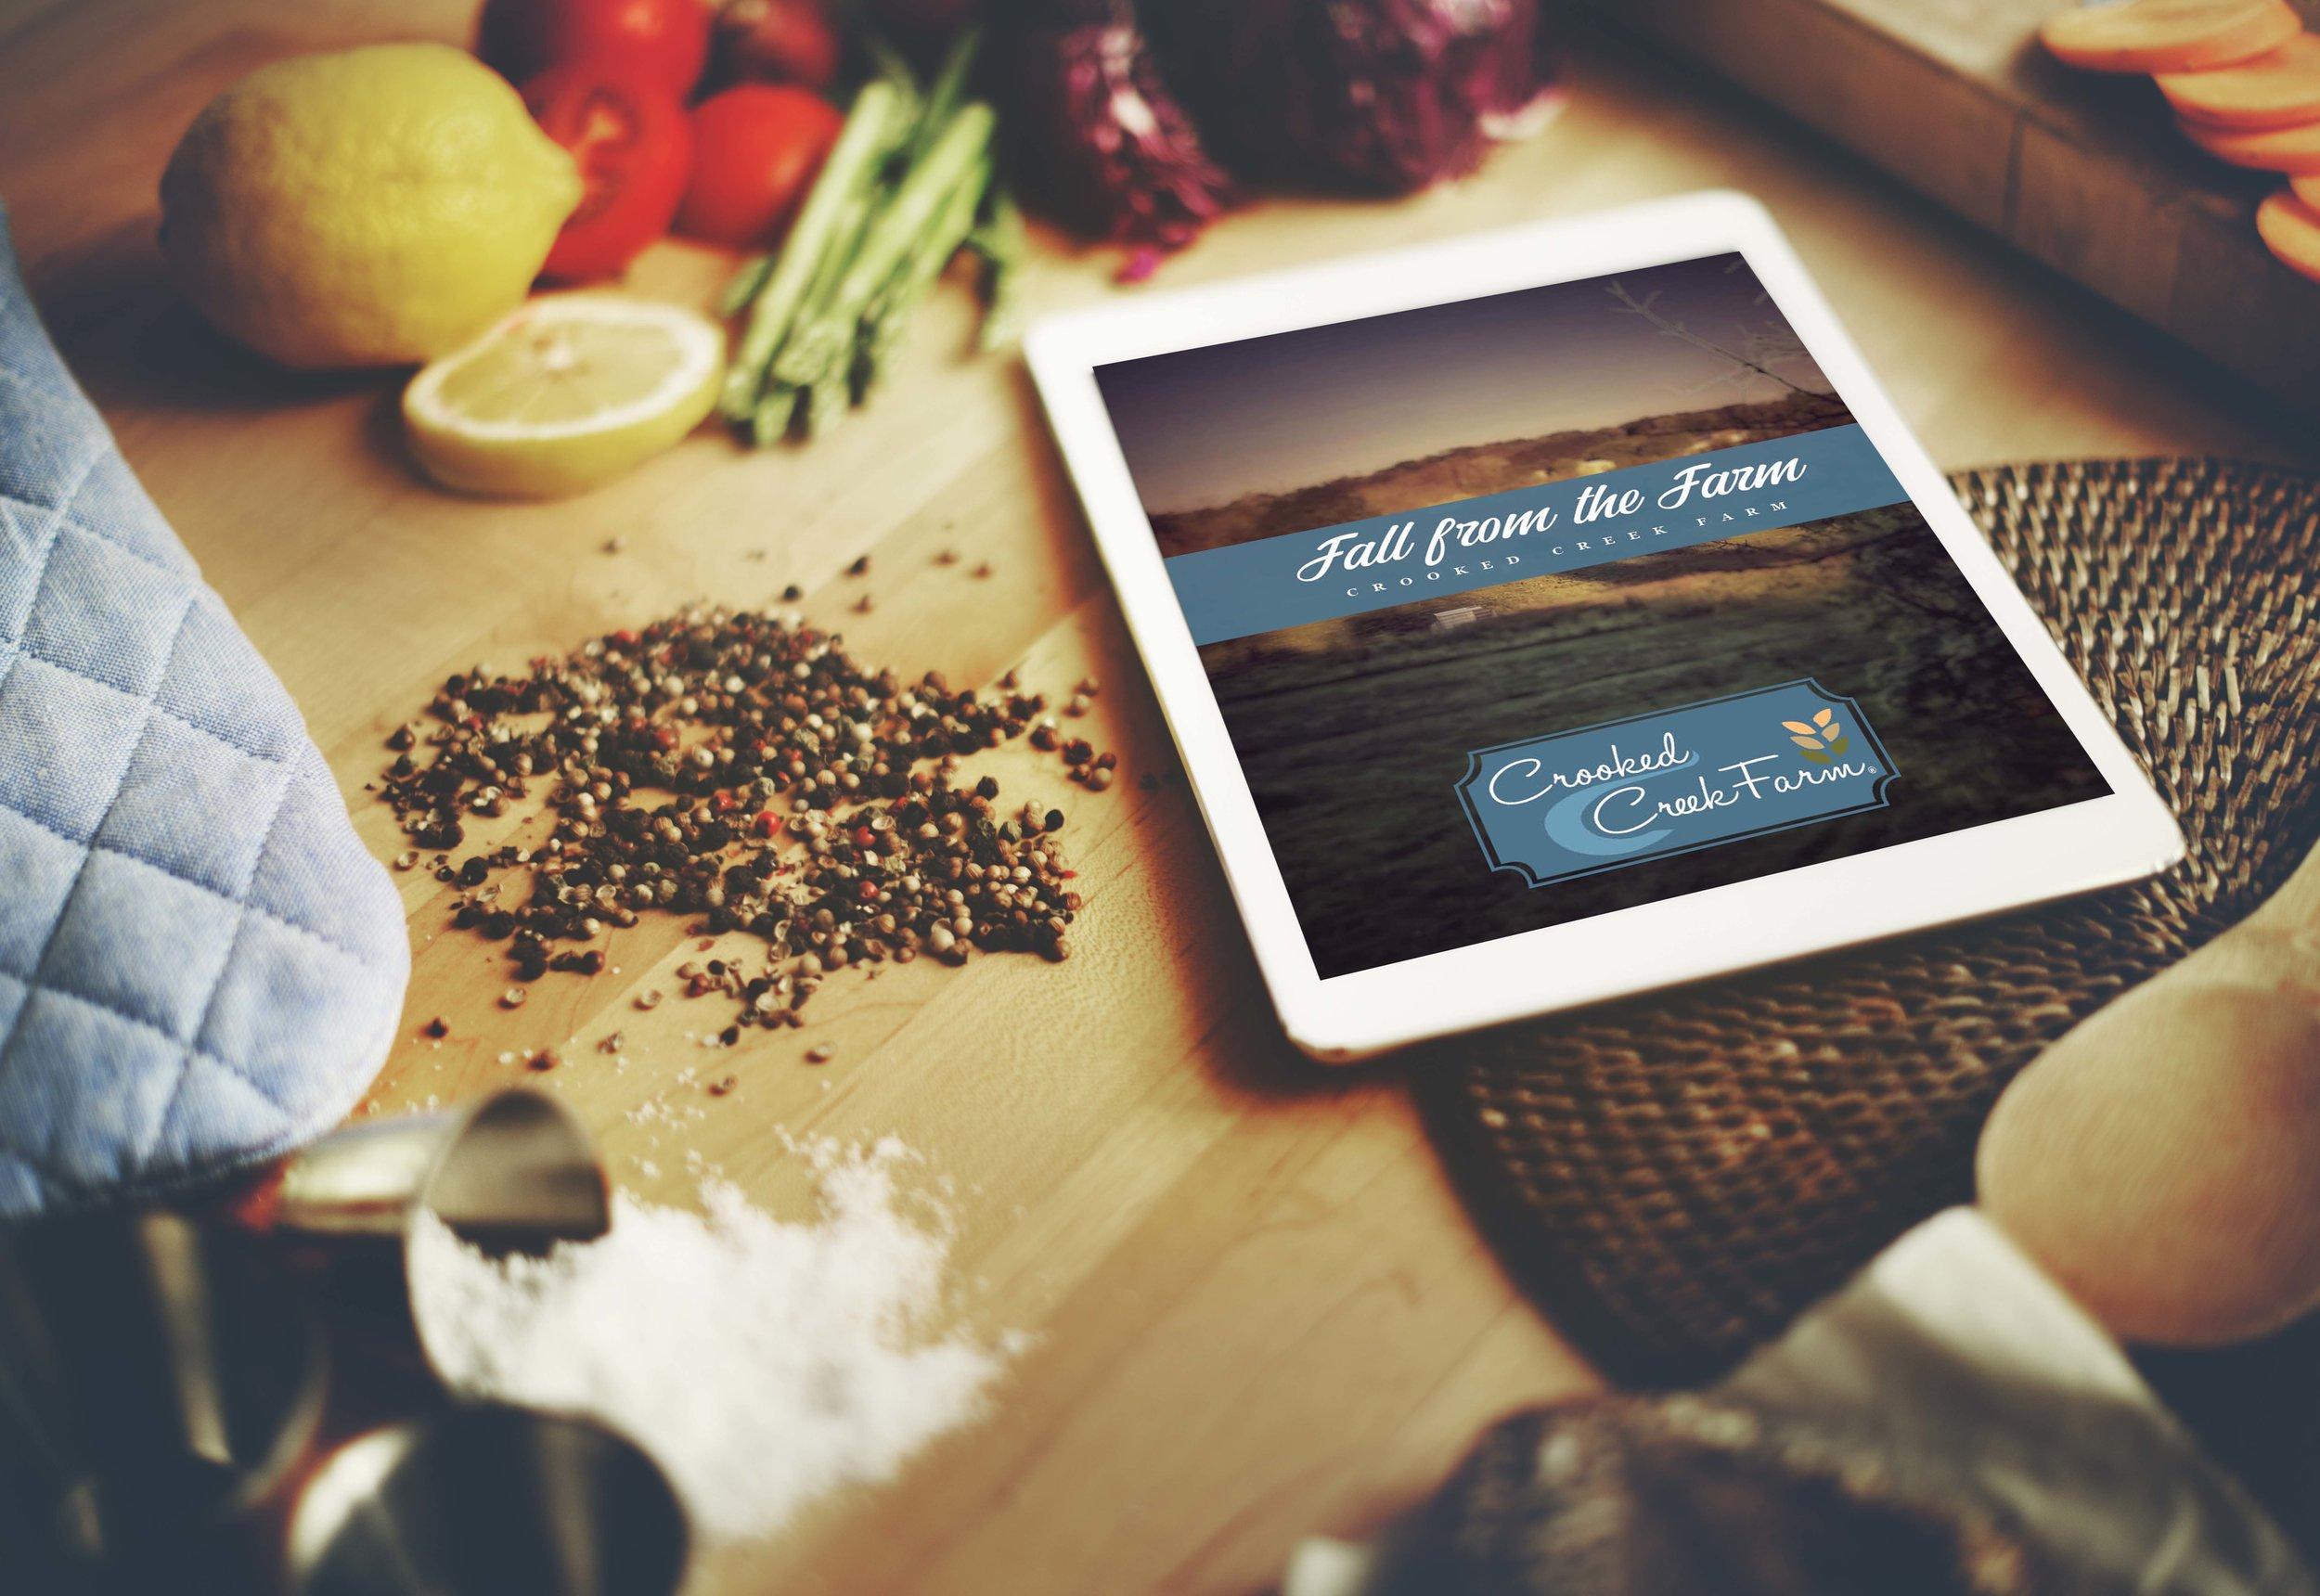 Crooked Creek Farm Cookbook Fall